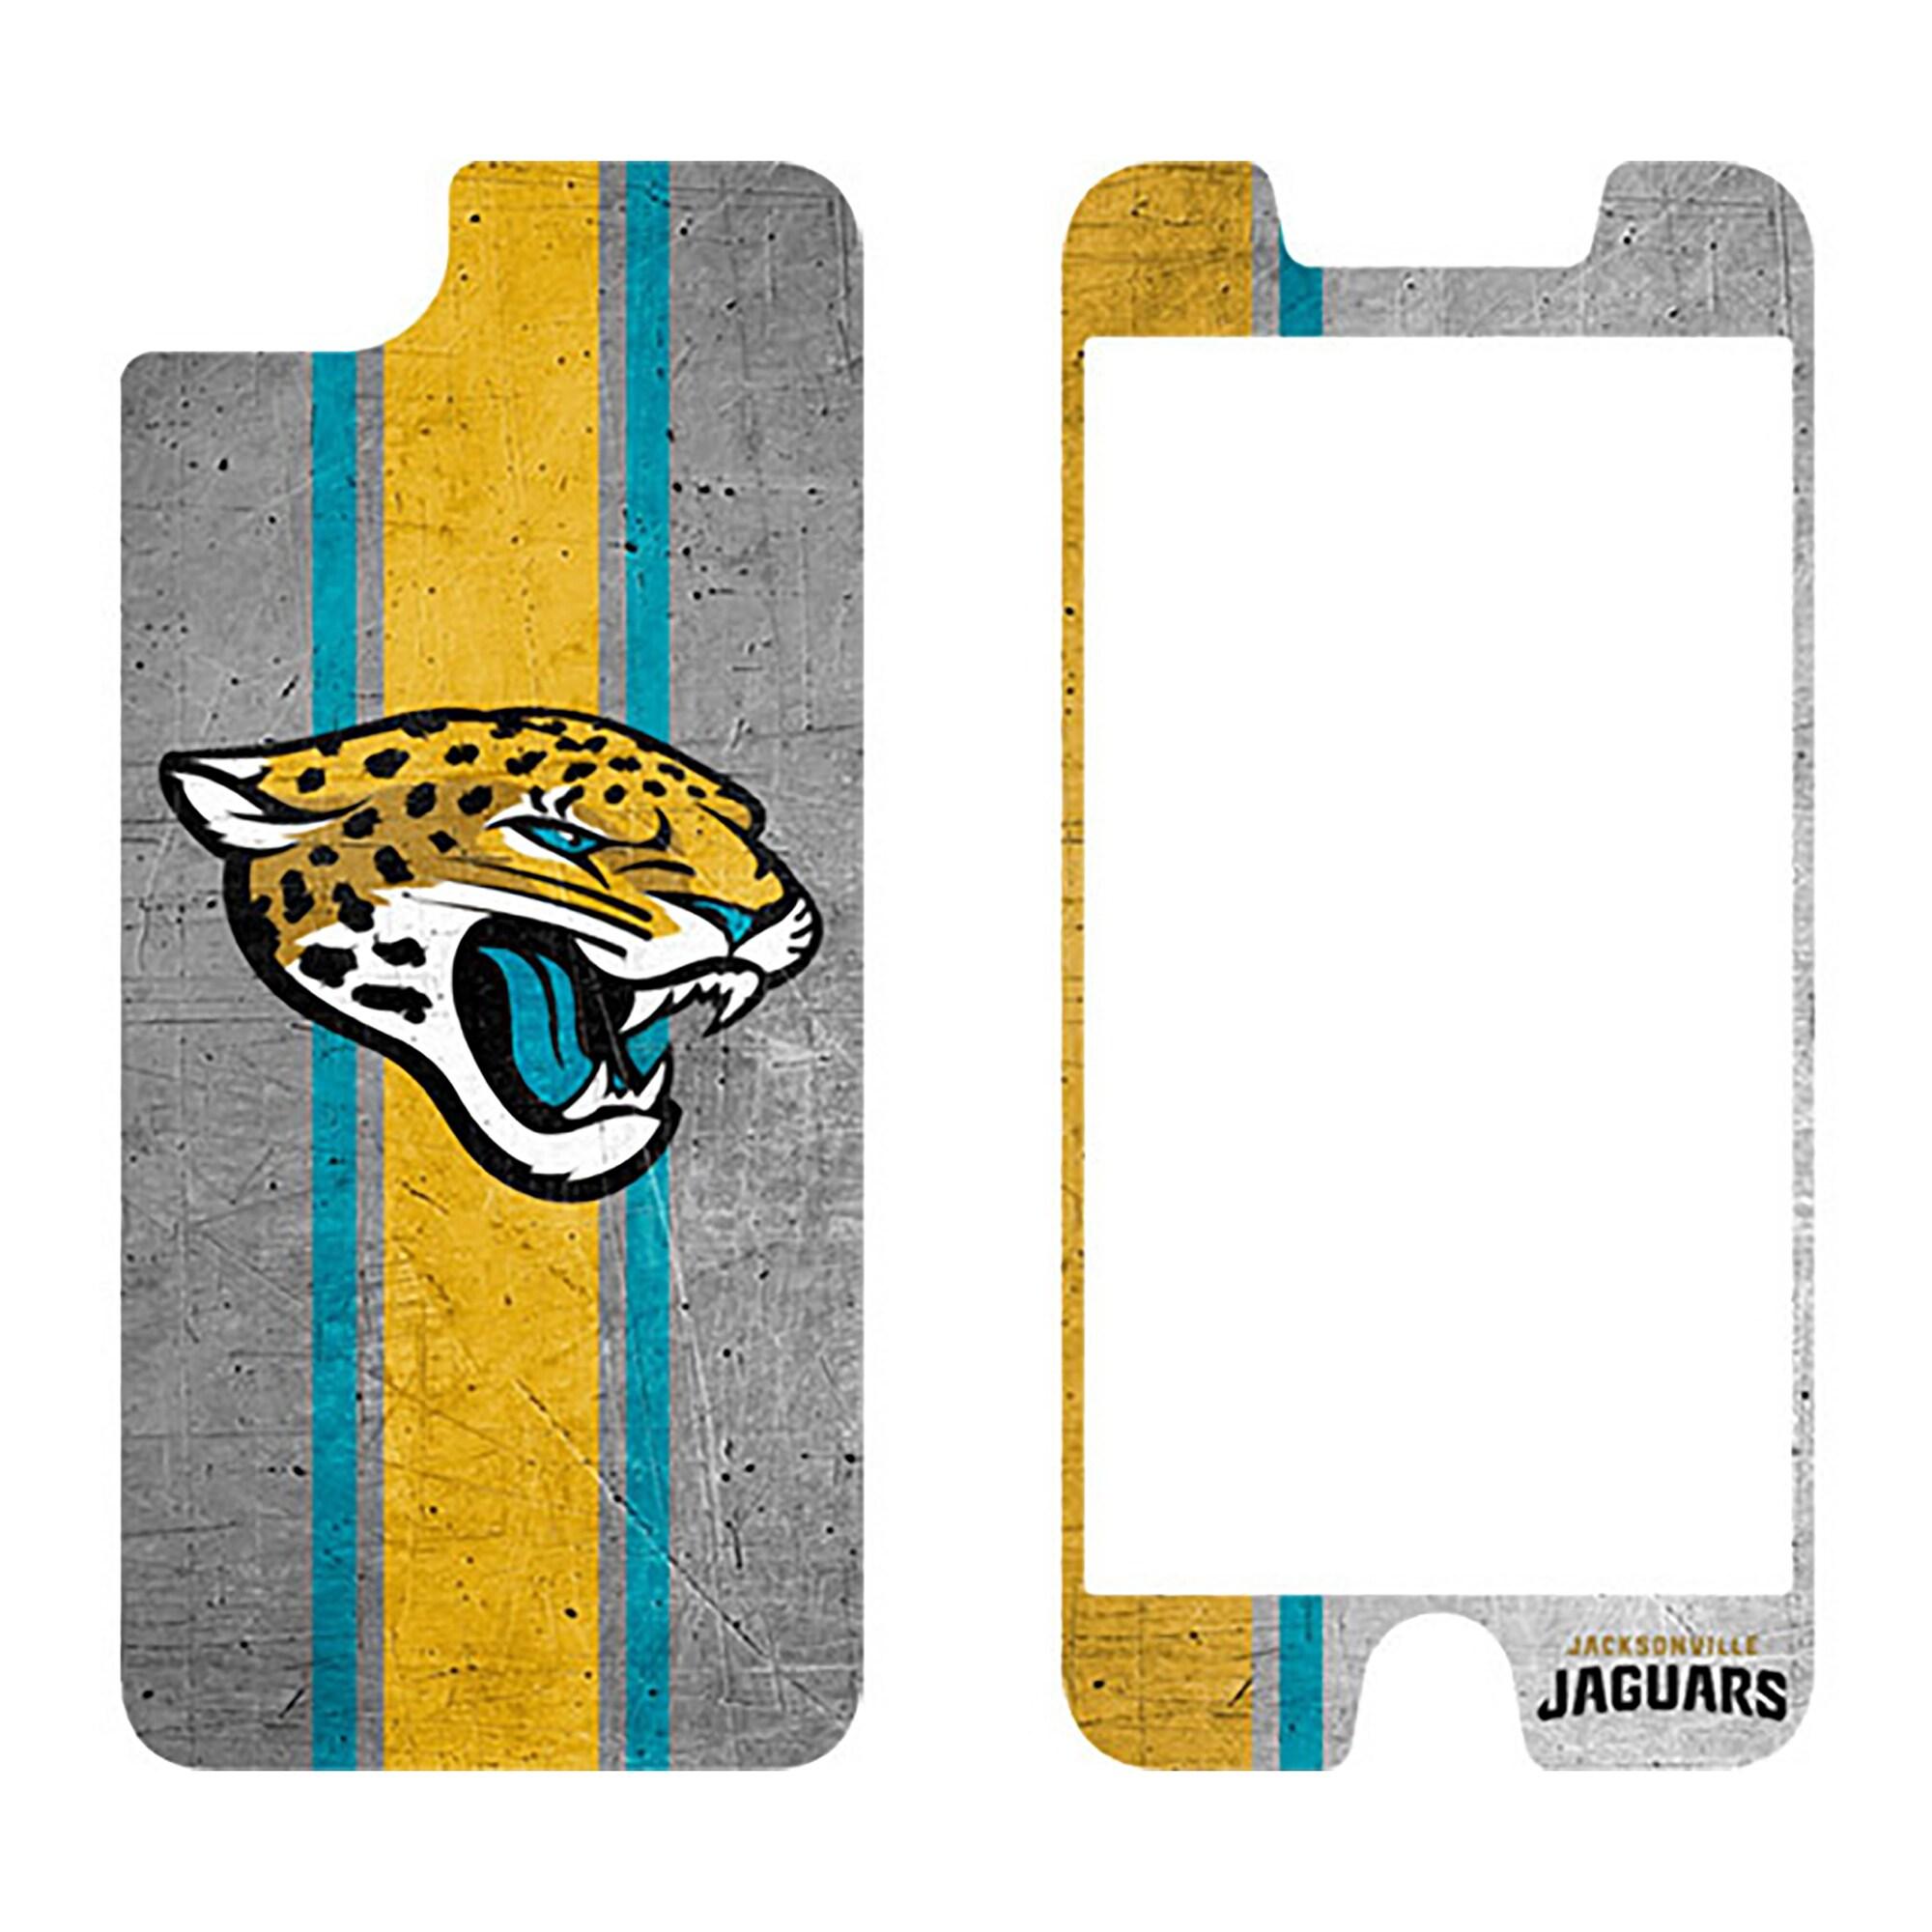 Jacksonville Jaguars OtterBox iPhone 8/7/6/6s Alpha Glass Screen Protector